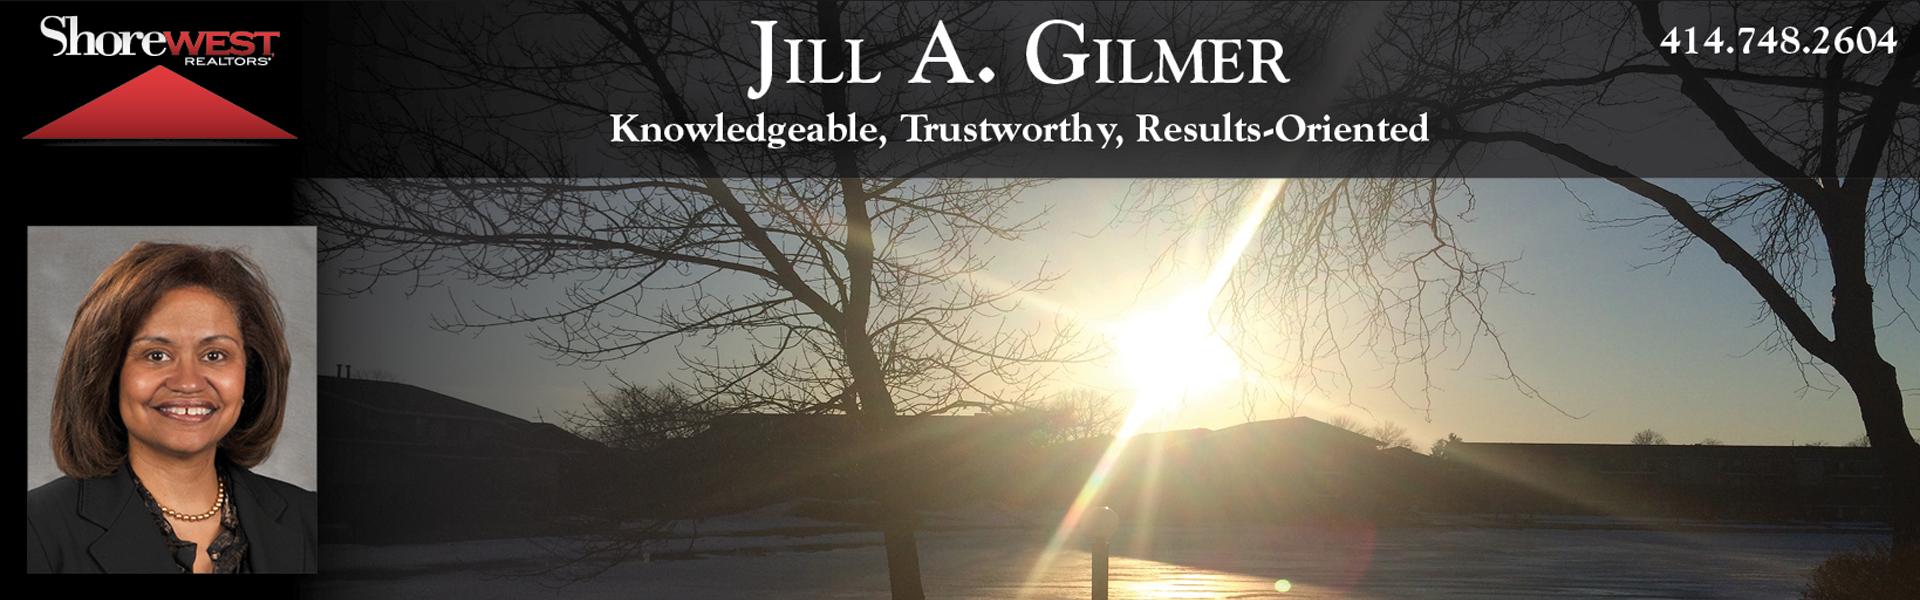 Jill A Gilmer